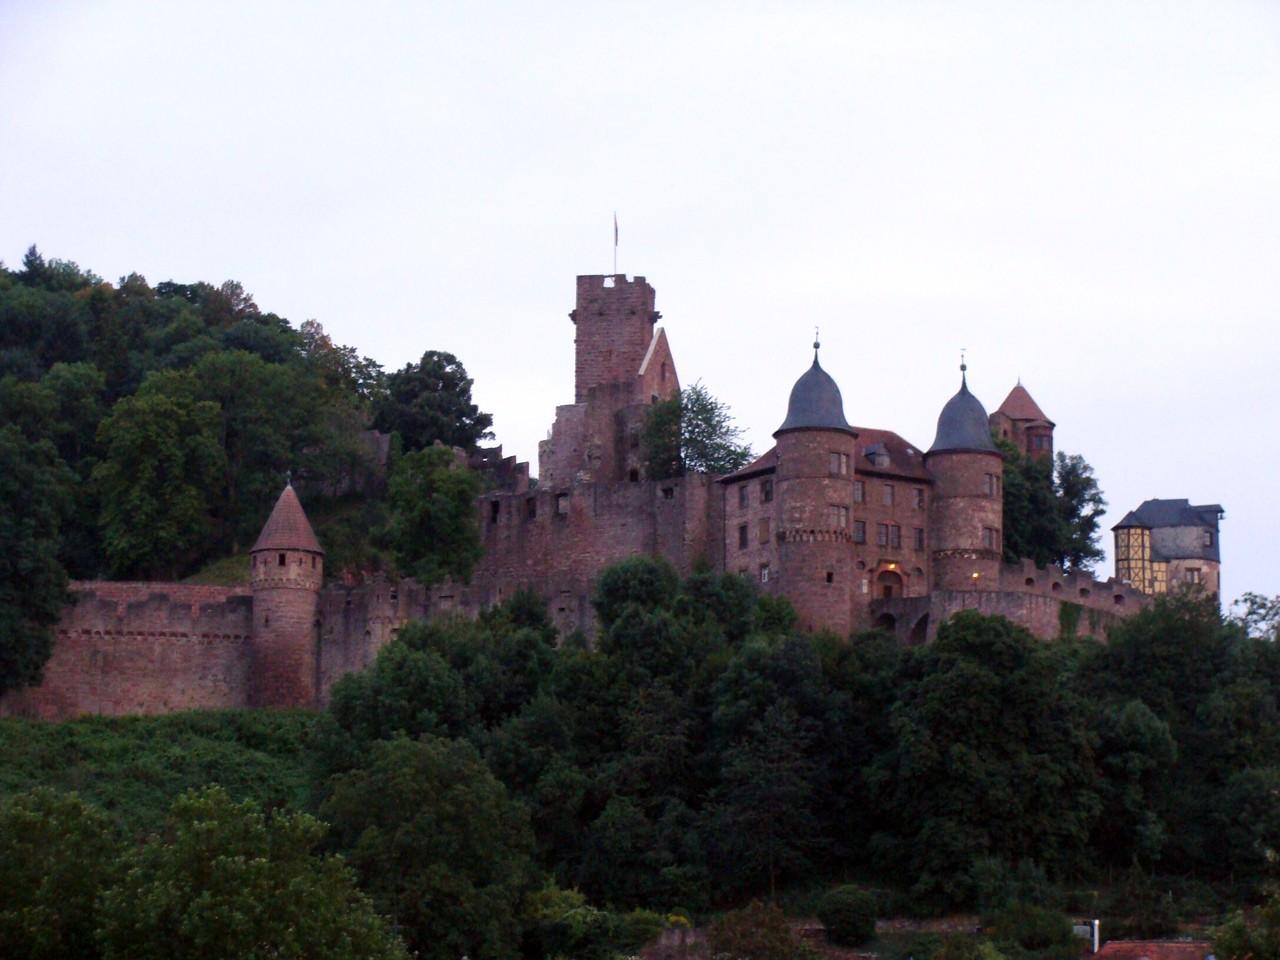 Noch mal das Schloss